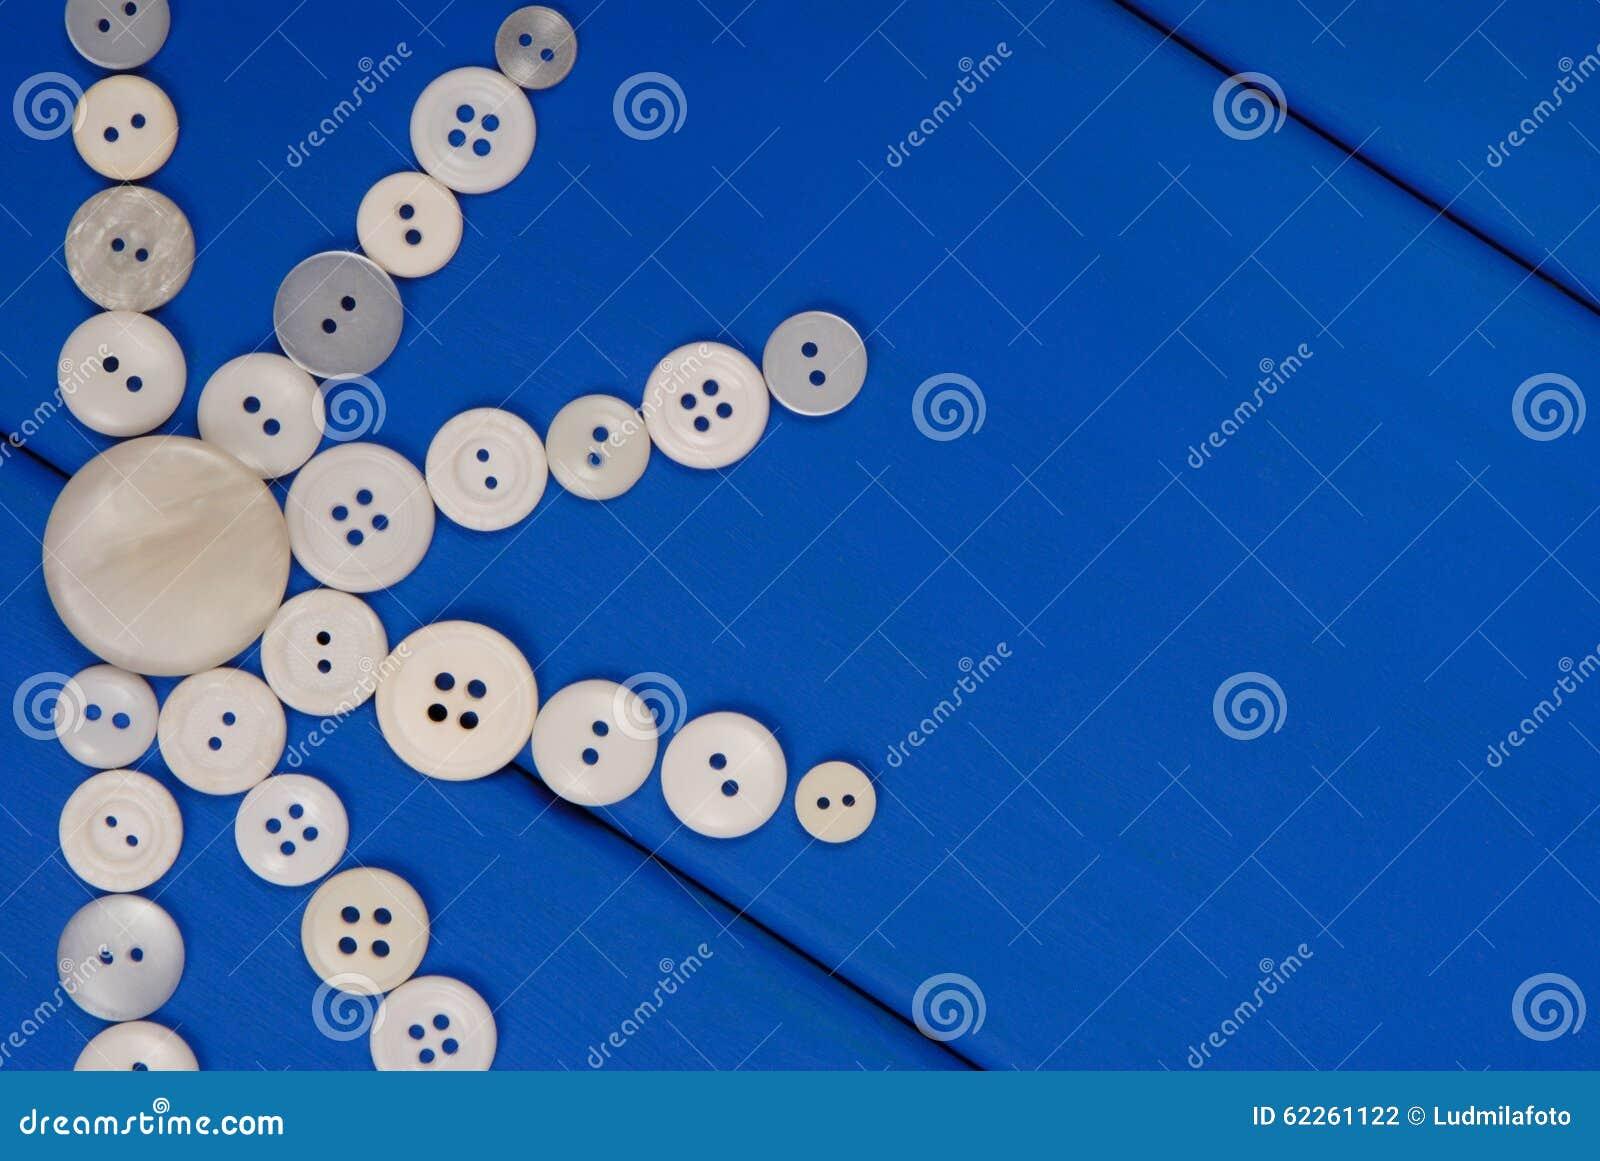 les boutons blancs sont sur le fond en bois bleu illustration stock illustration du meubles. Black Bedroom Furniture Sets. Home Design Ideas